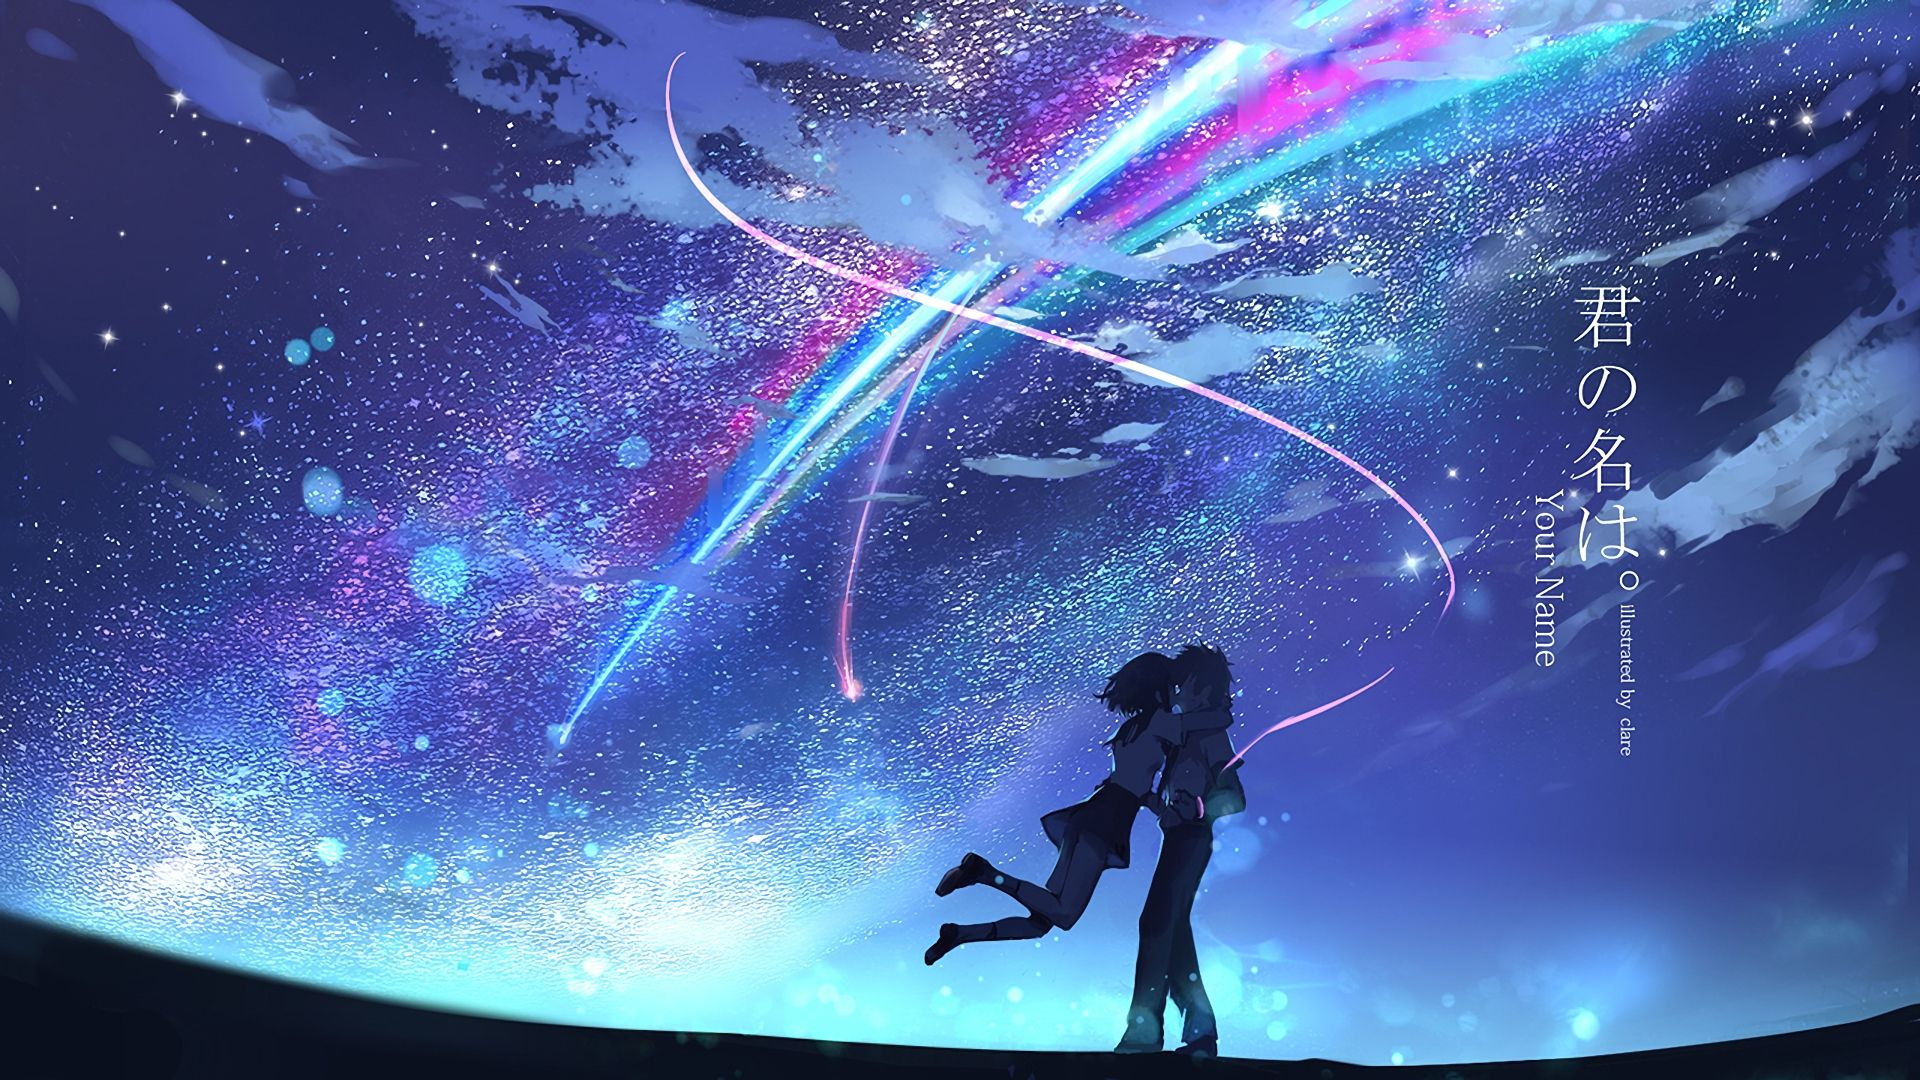 10 Best Kimi No Na Wa Desktop Wallpaper Full Hd 1920 1080 For Pc Desktop Latar Belakang Gambar Anime Pemandangan Anime